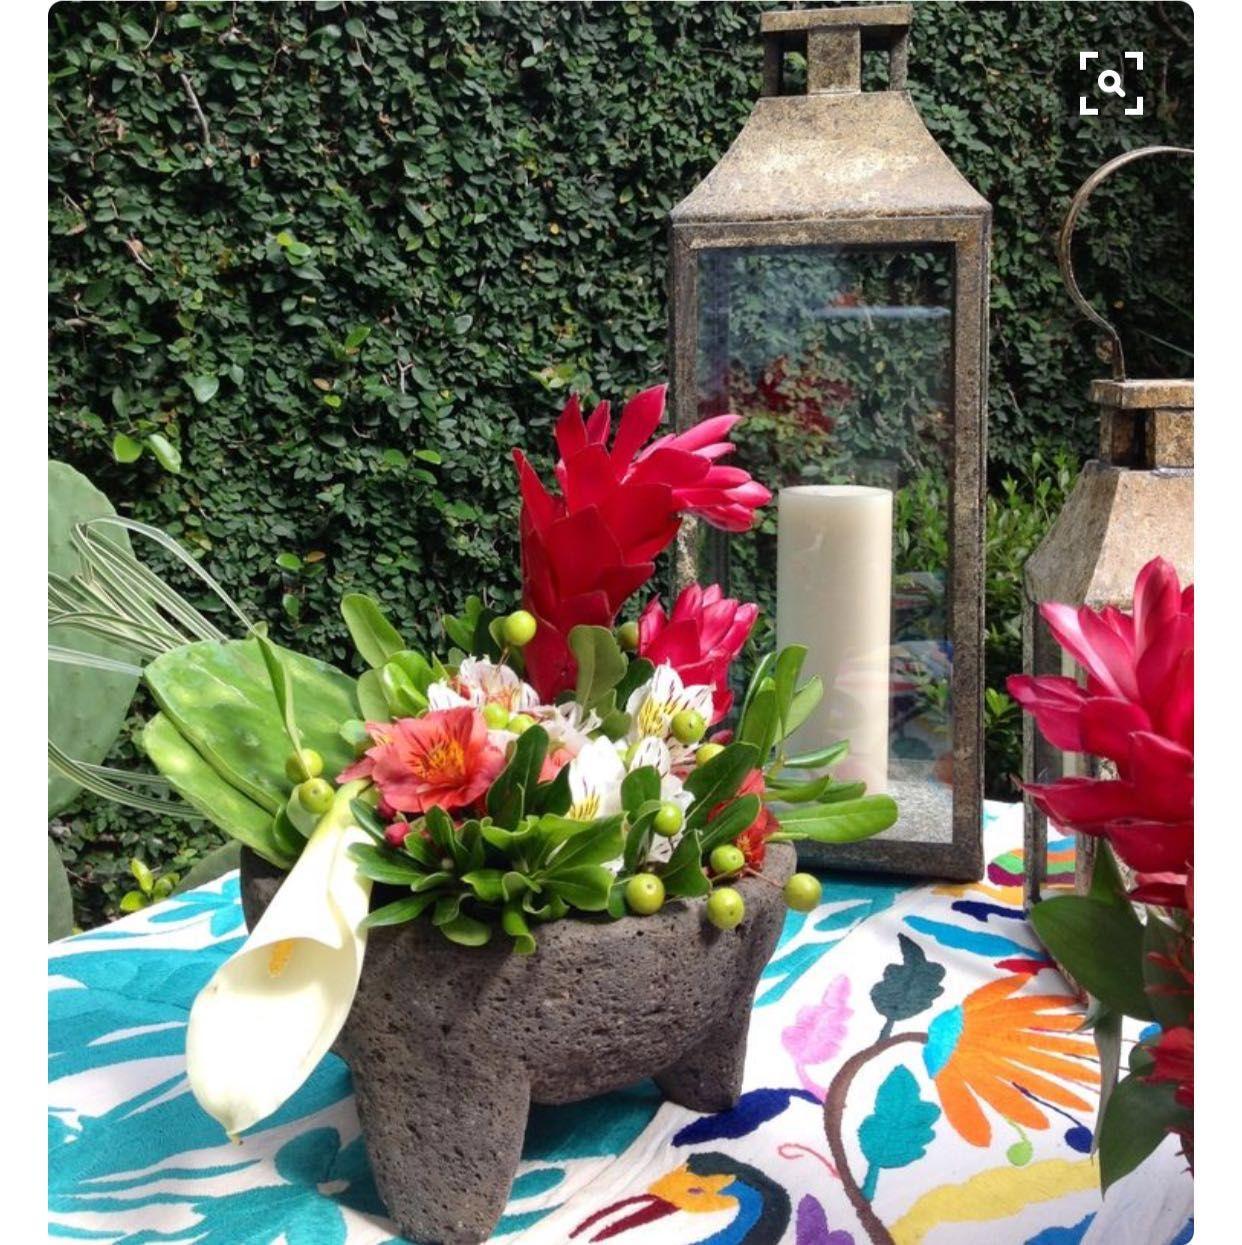 Mexican Wedding Favors Ideas: Pin By Laura Ramirez On Wedding Ideas